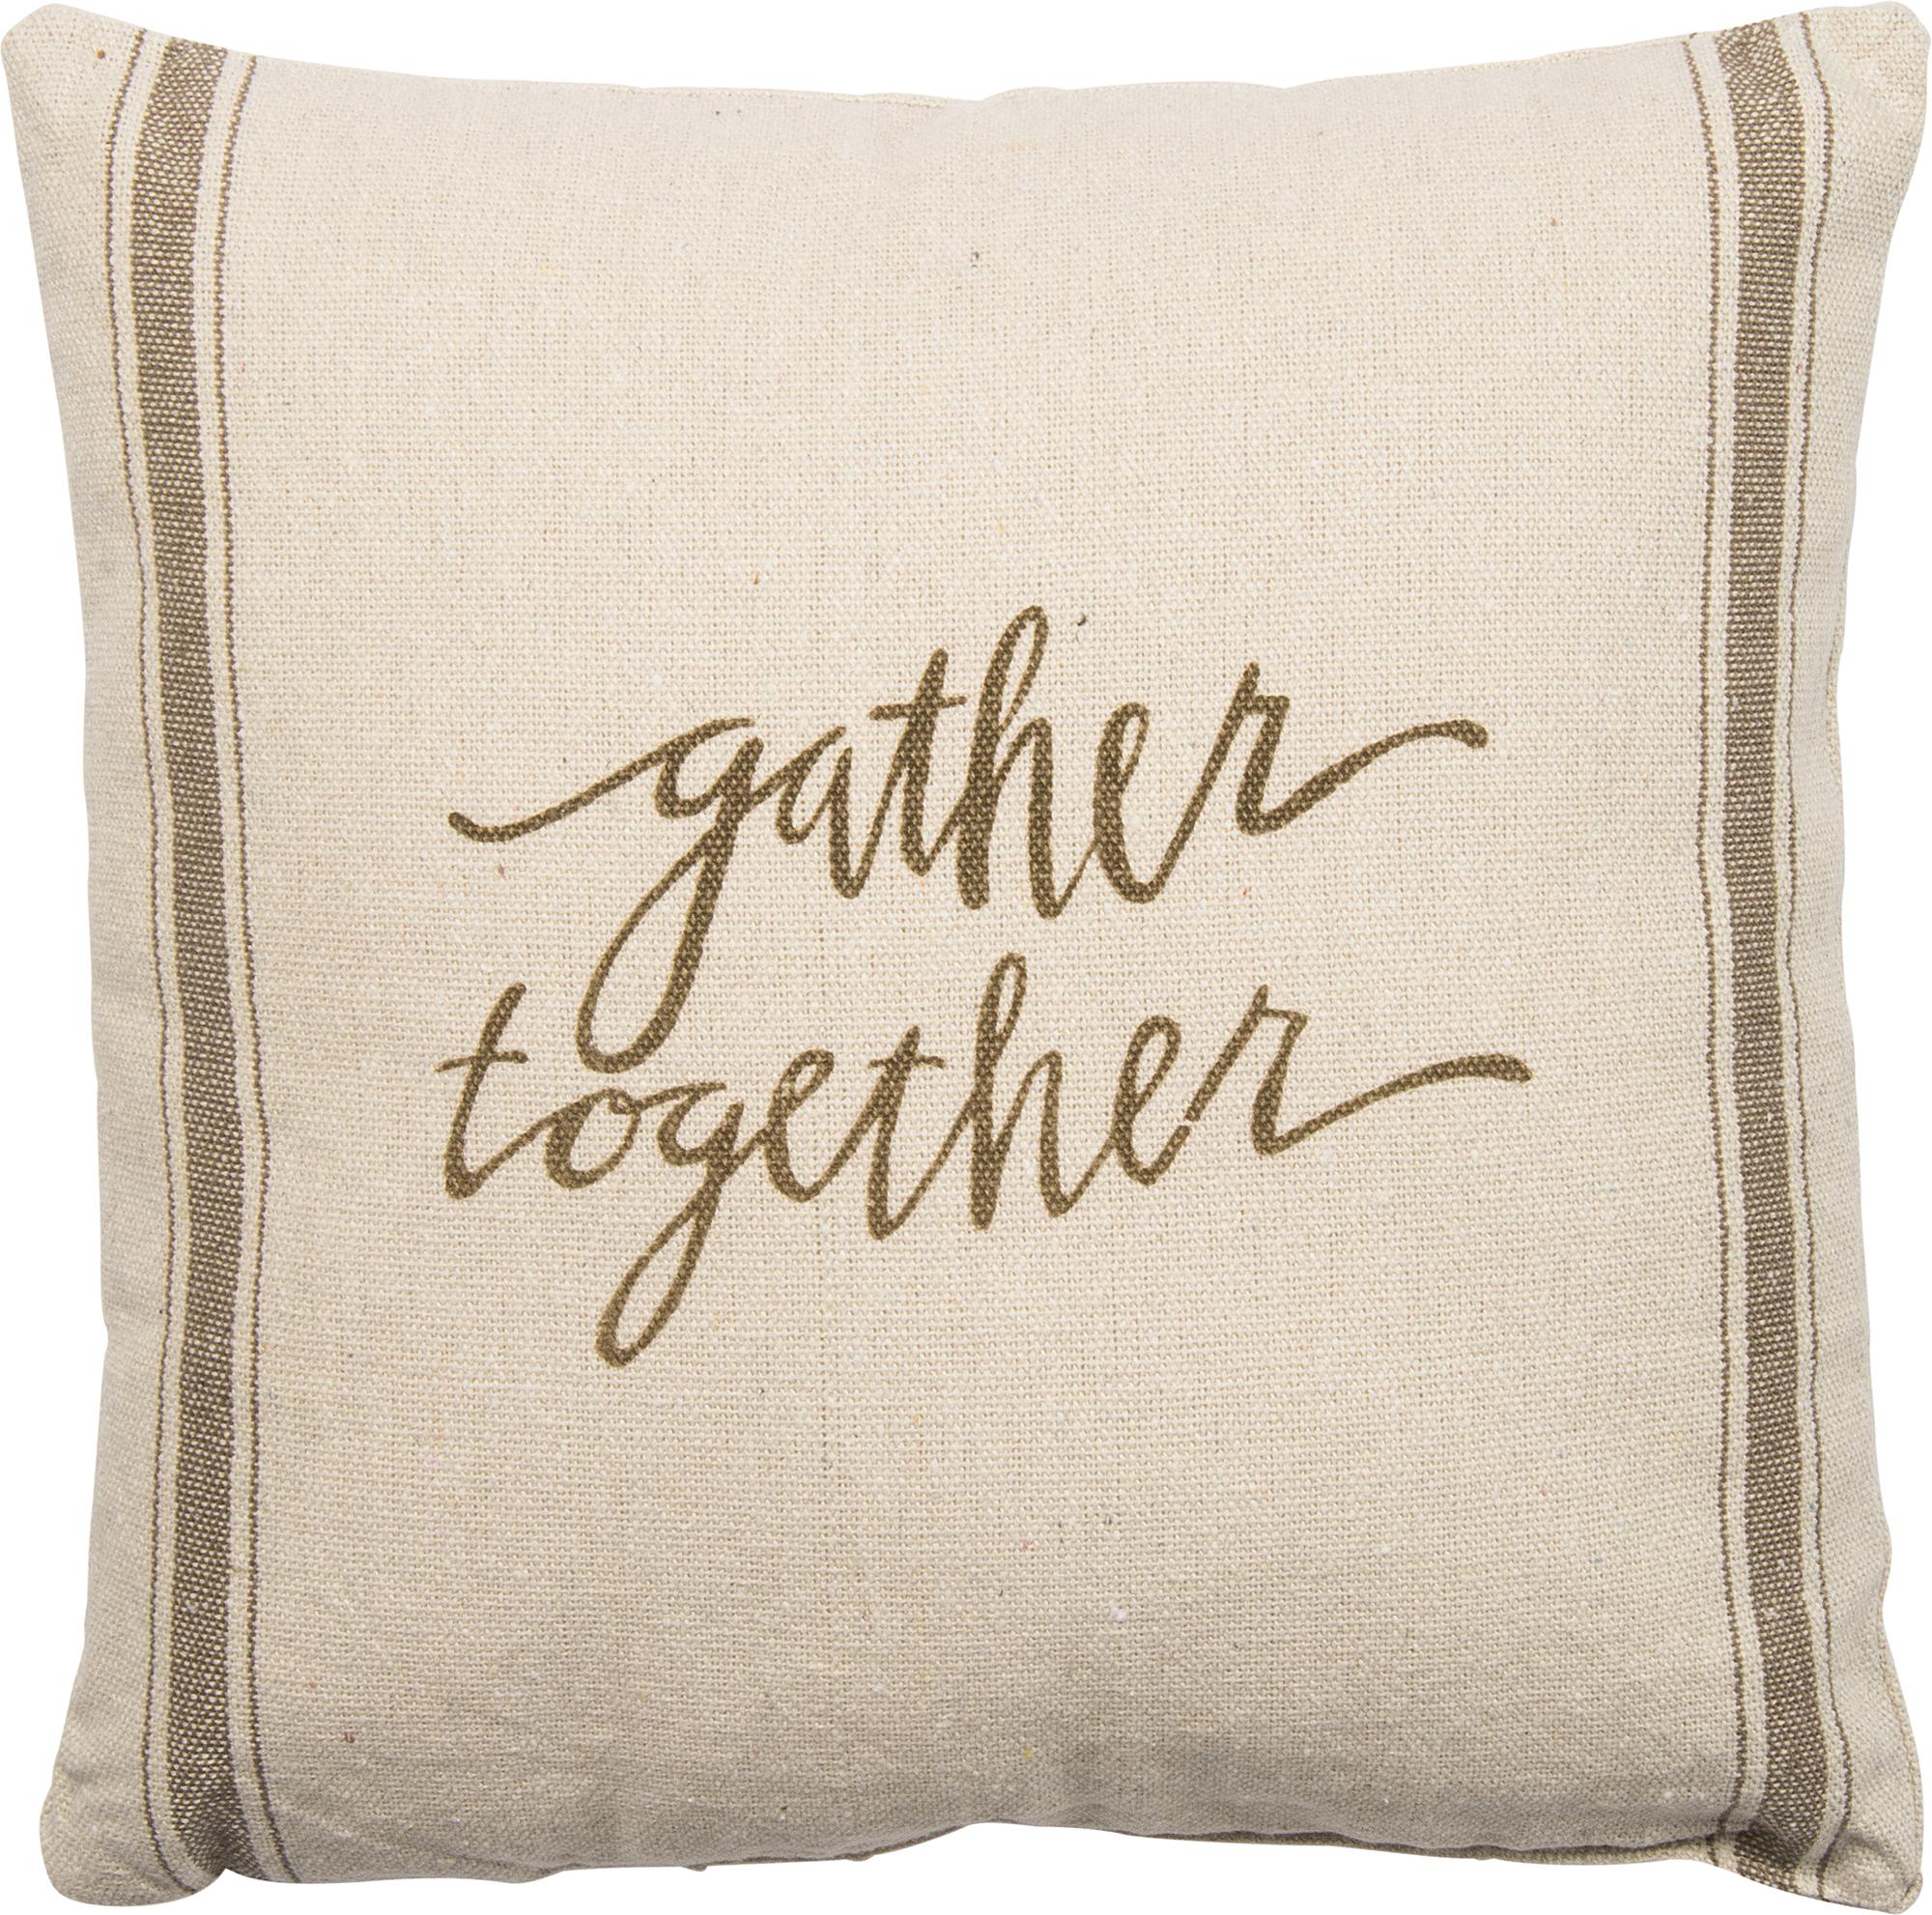 Gather Together $18